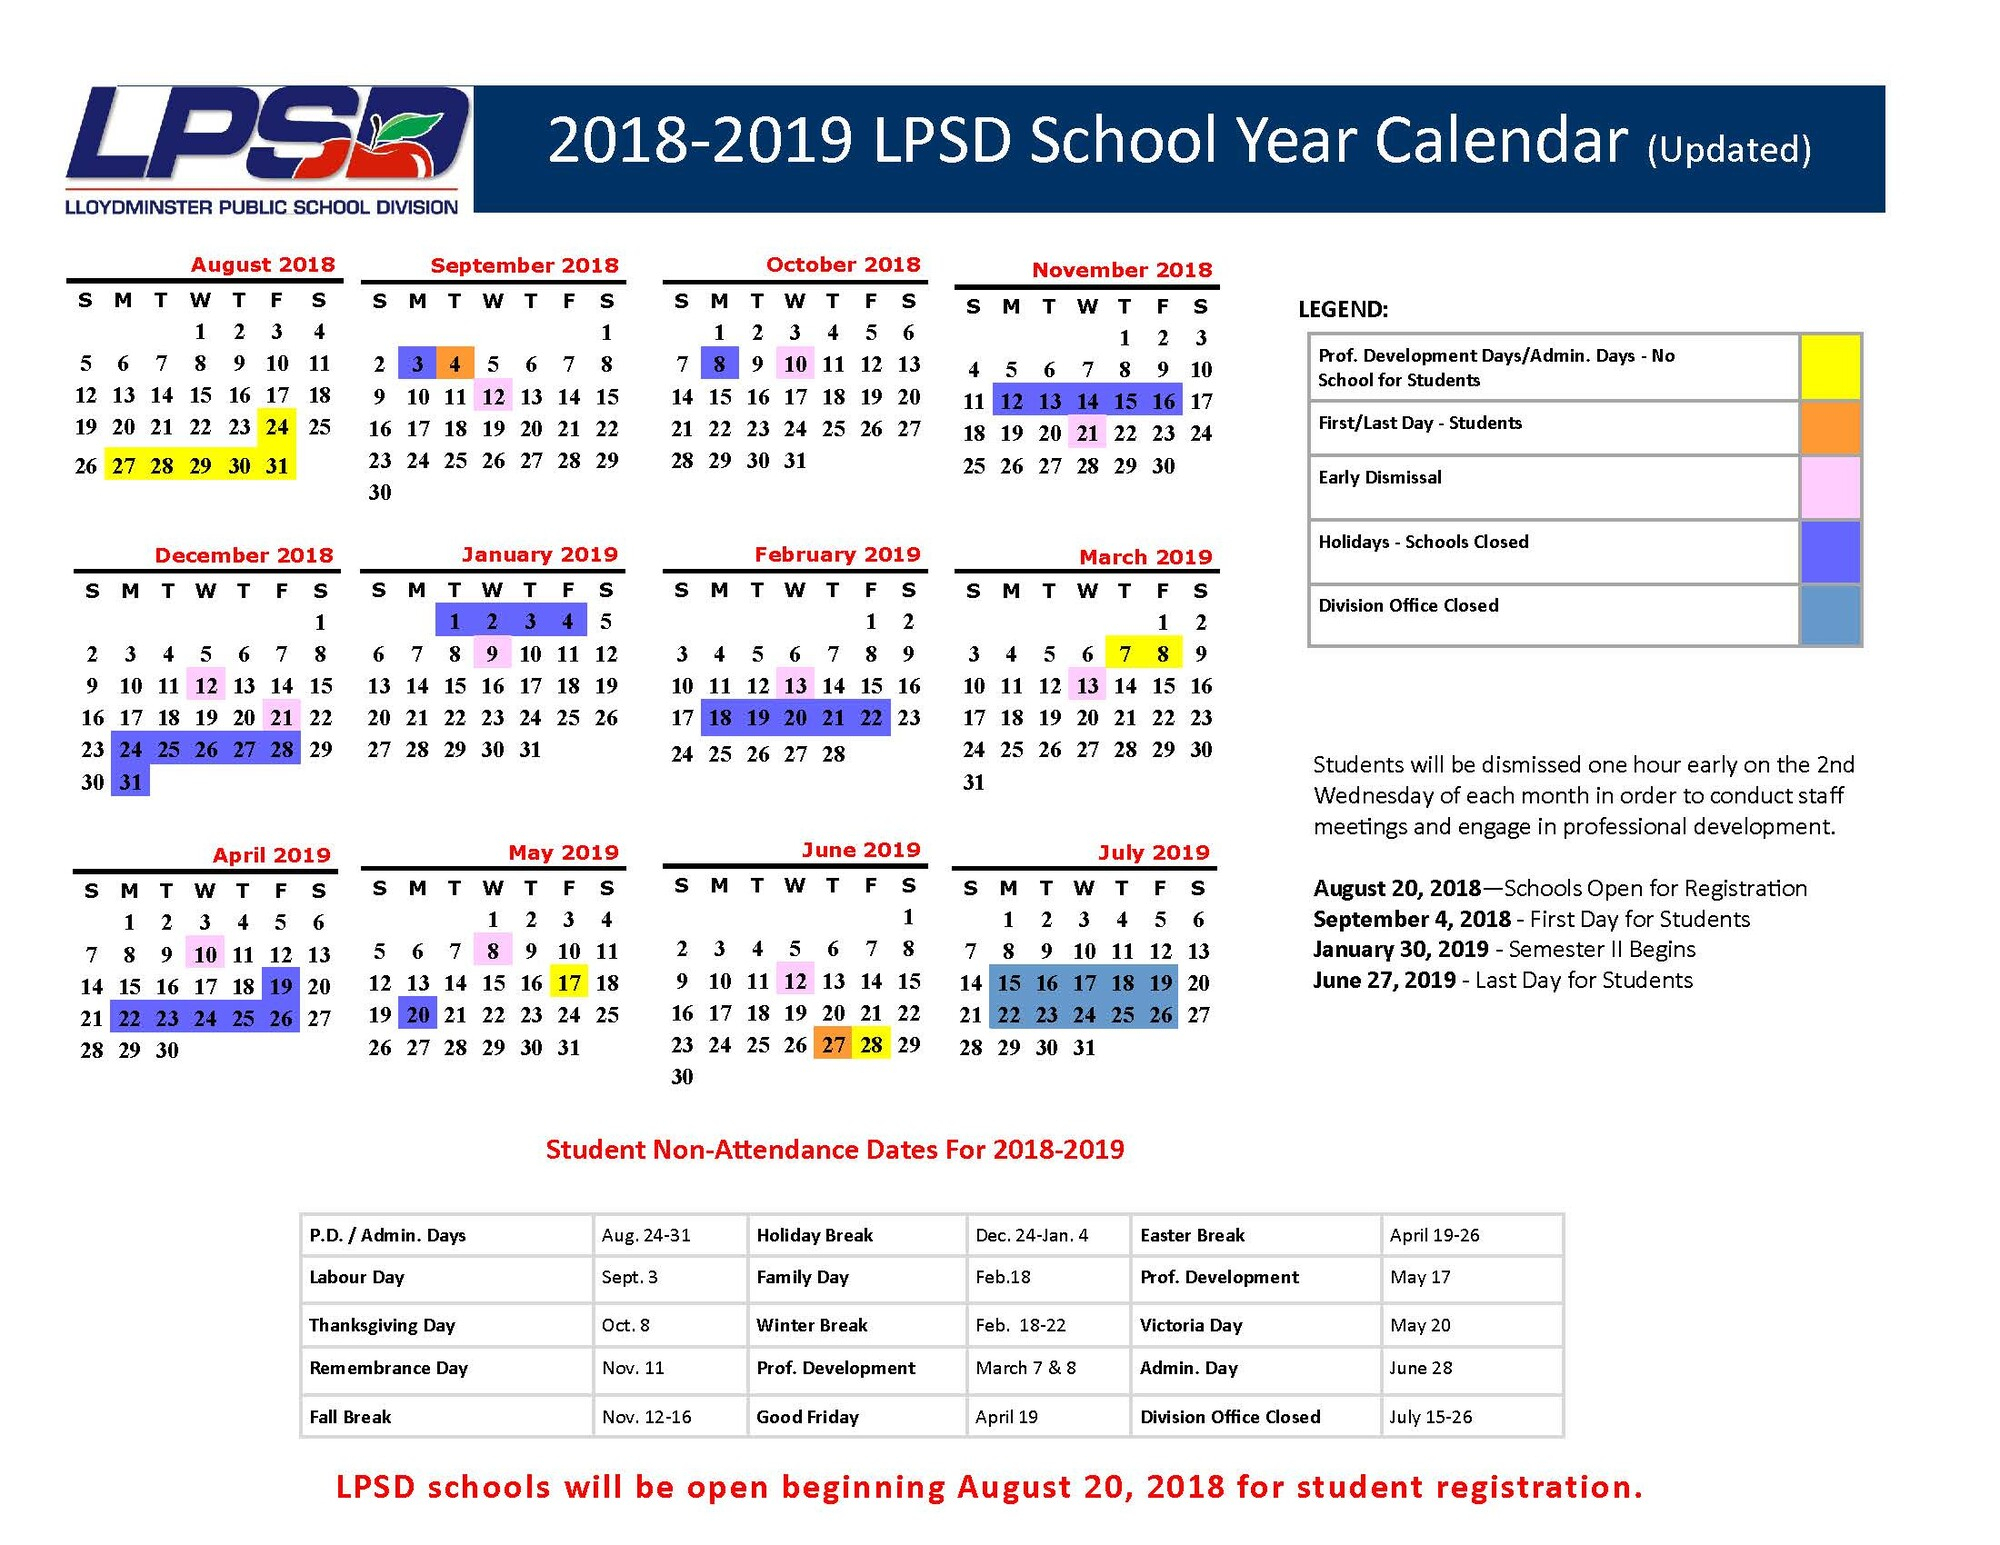 New Calendar For Current School Year | College Park School